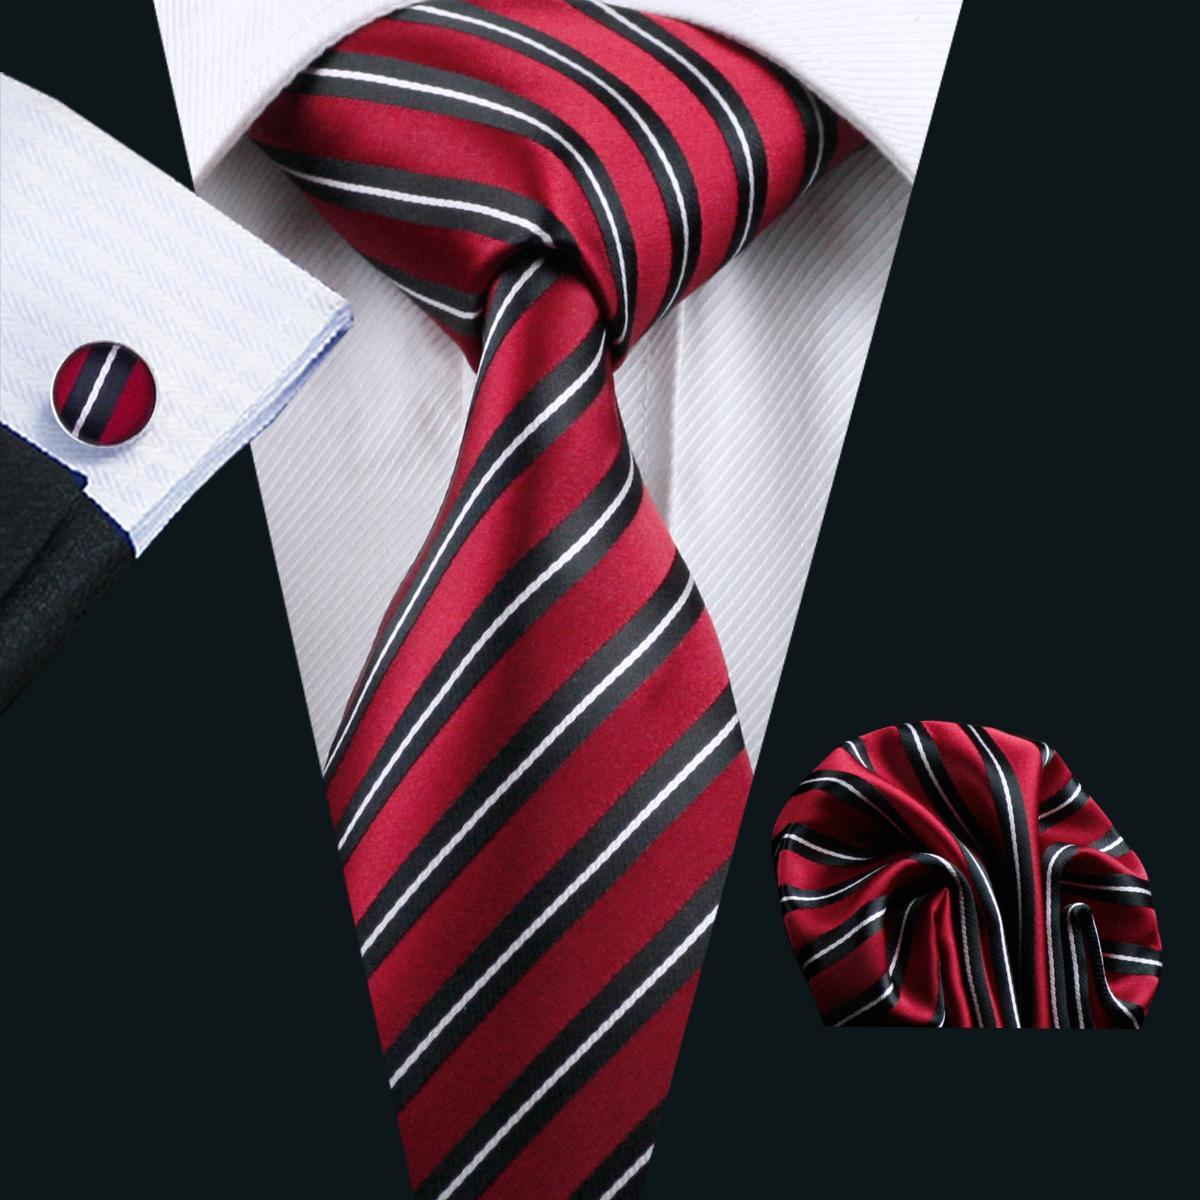 Mens Classic Red Black Stripe Silk Tie Hankerchief Cufflinks Set Business Formal Work Party Tie Jacquard Woven N-0322